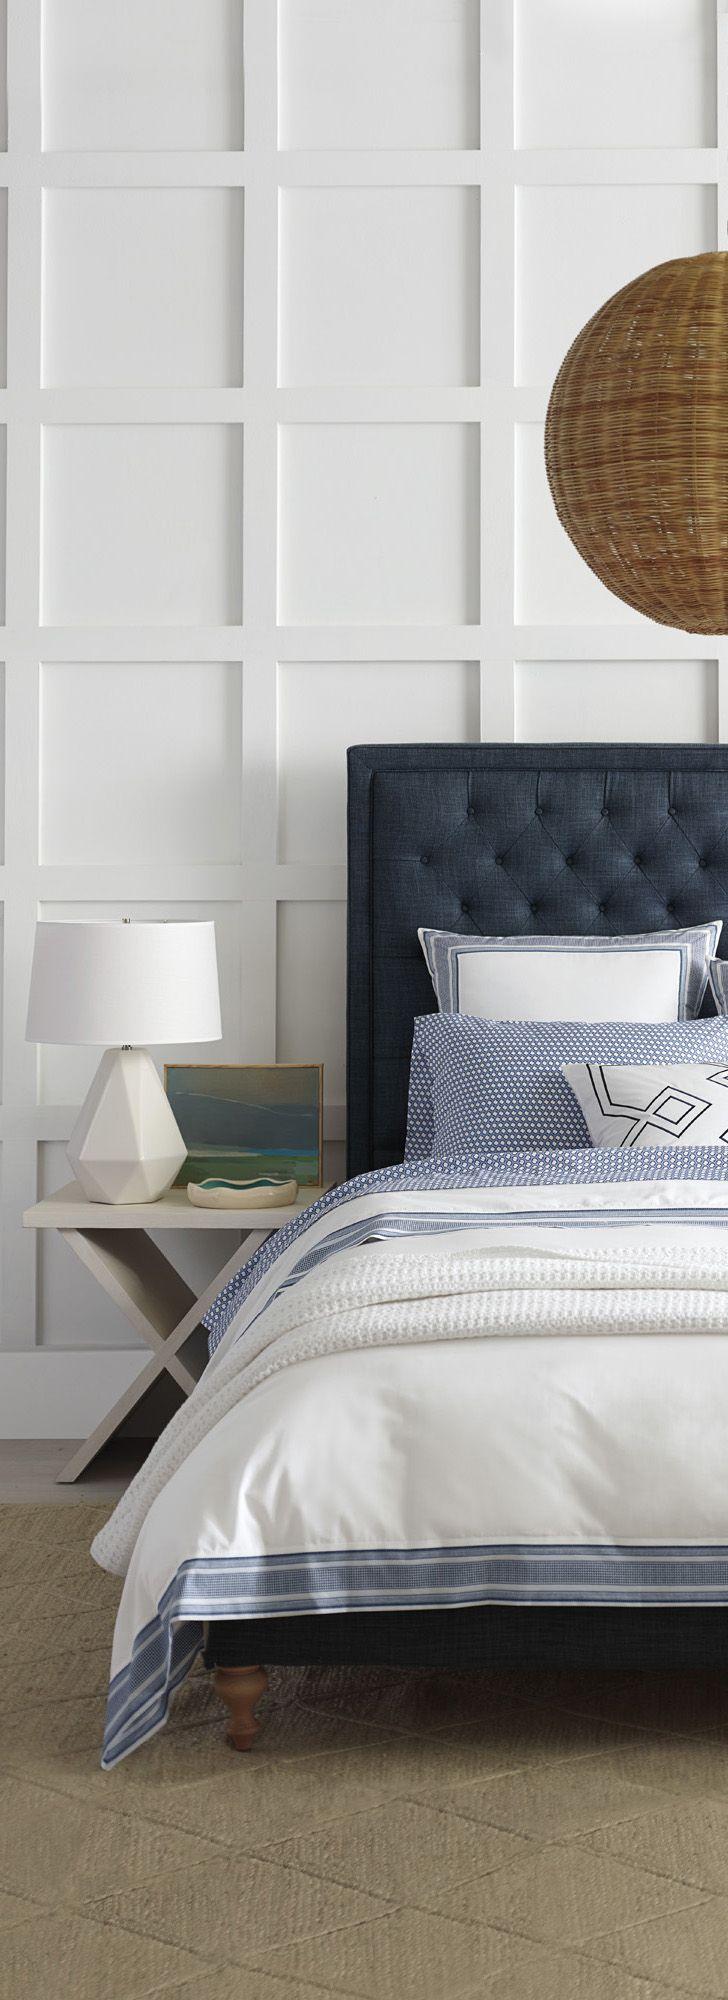 346 best bedroom ideas images on pinterest master bedrooms